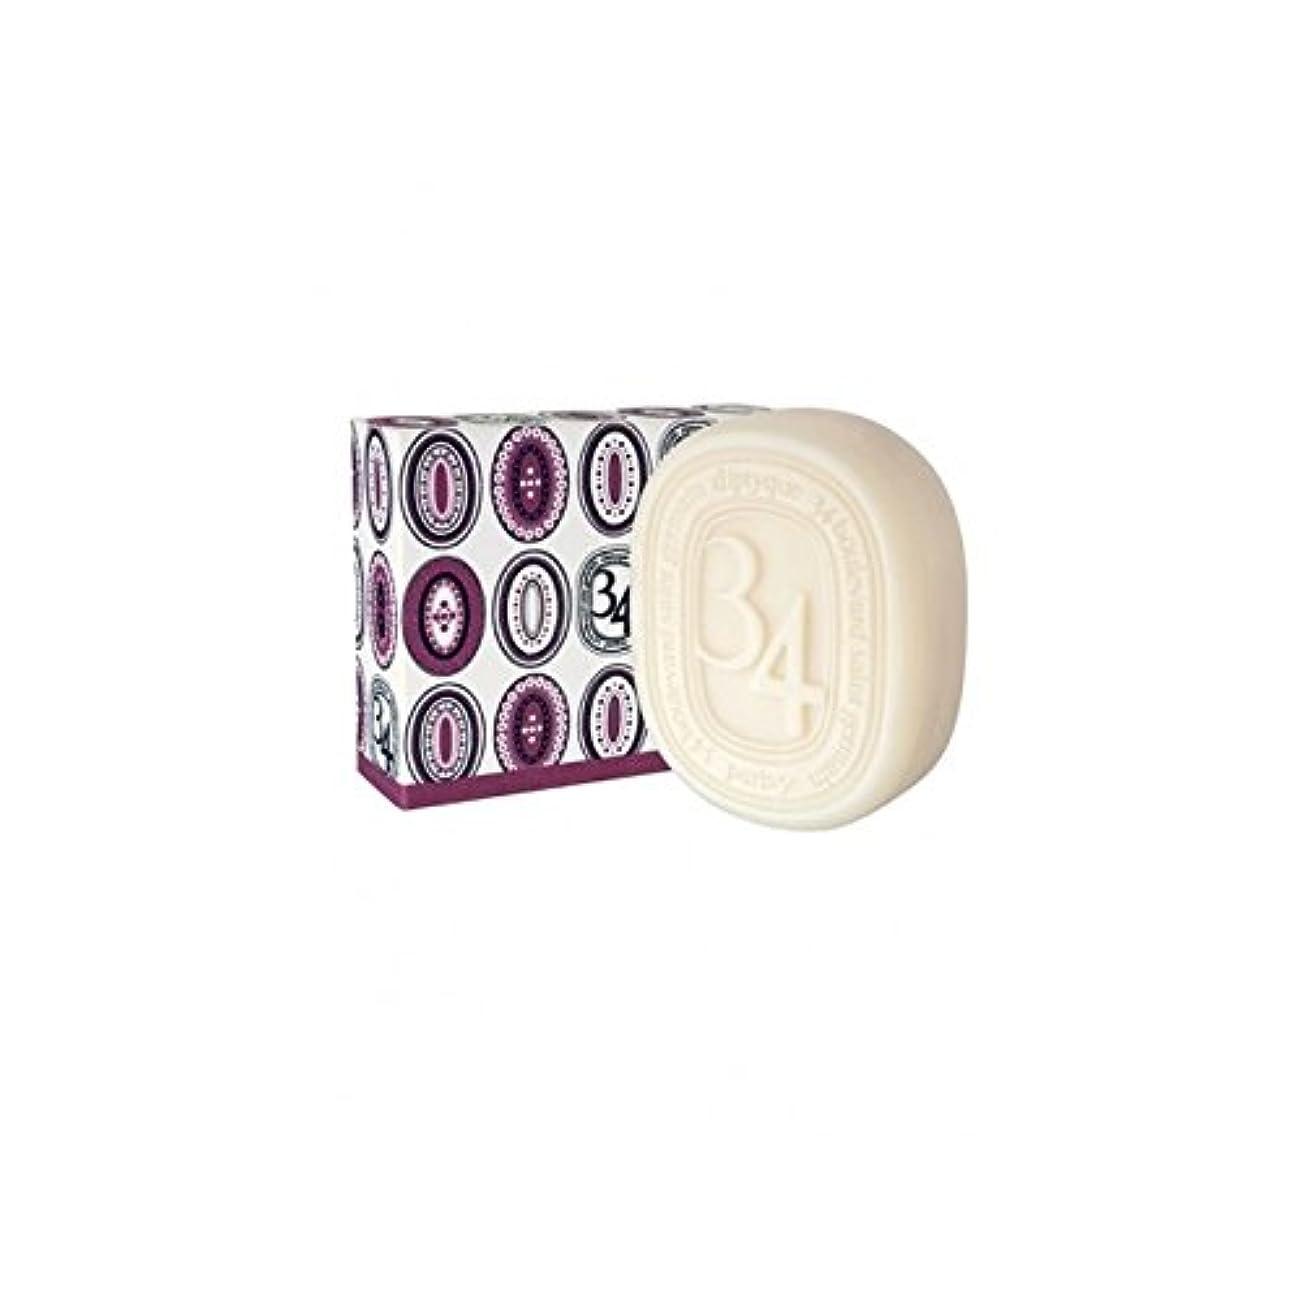 Diptyque Collection 34 Boulevard Saint Germain Soap 100g (Pack of 6) - Diptyqueコレクション34大通りサンジェルマン石鹸100グラム (x6)...